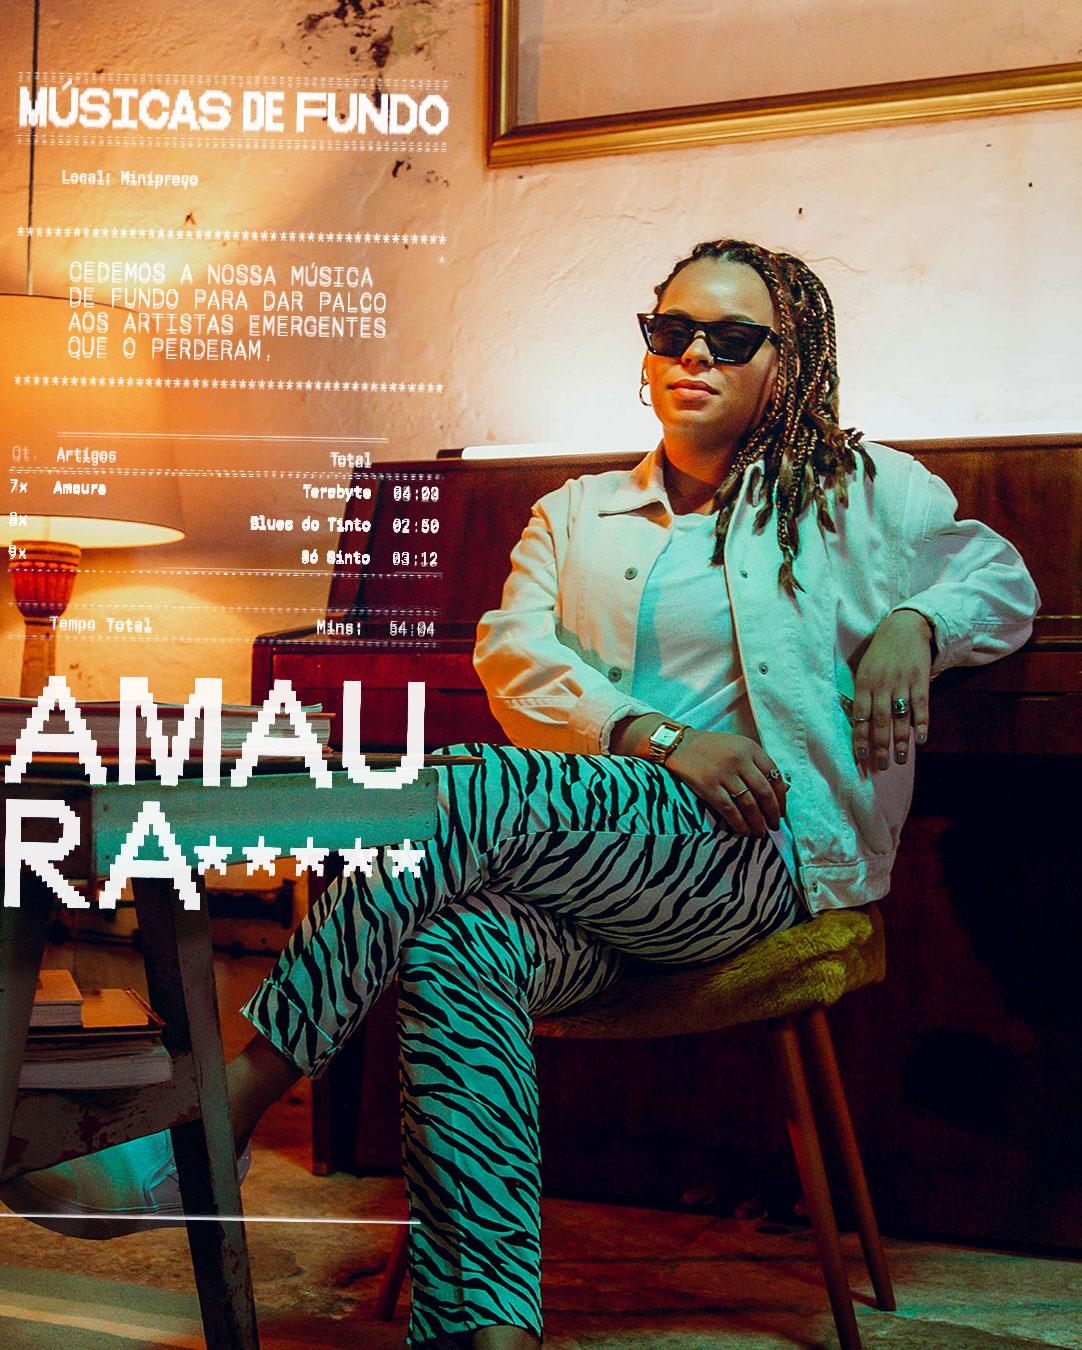 AMAURA Spotify